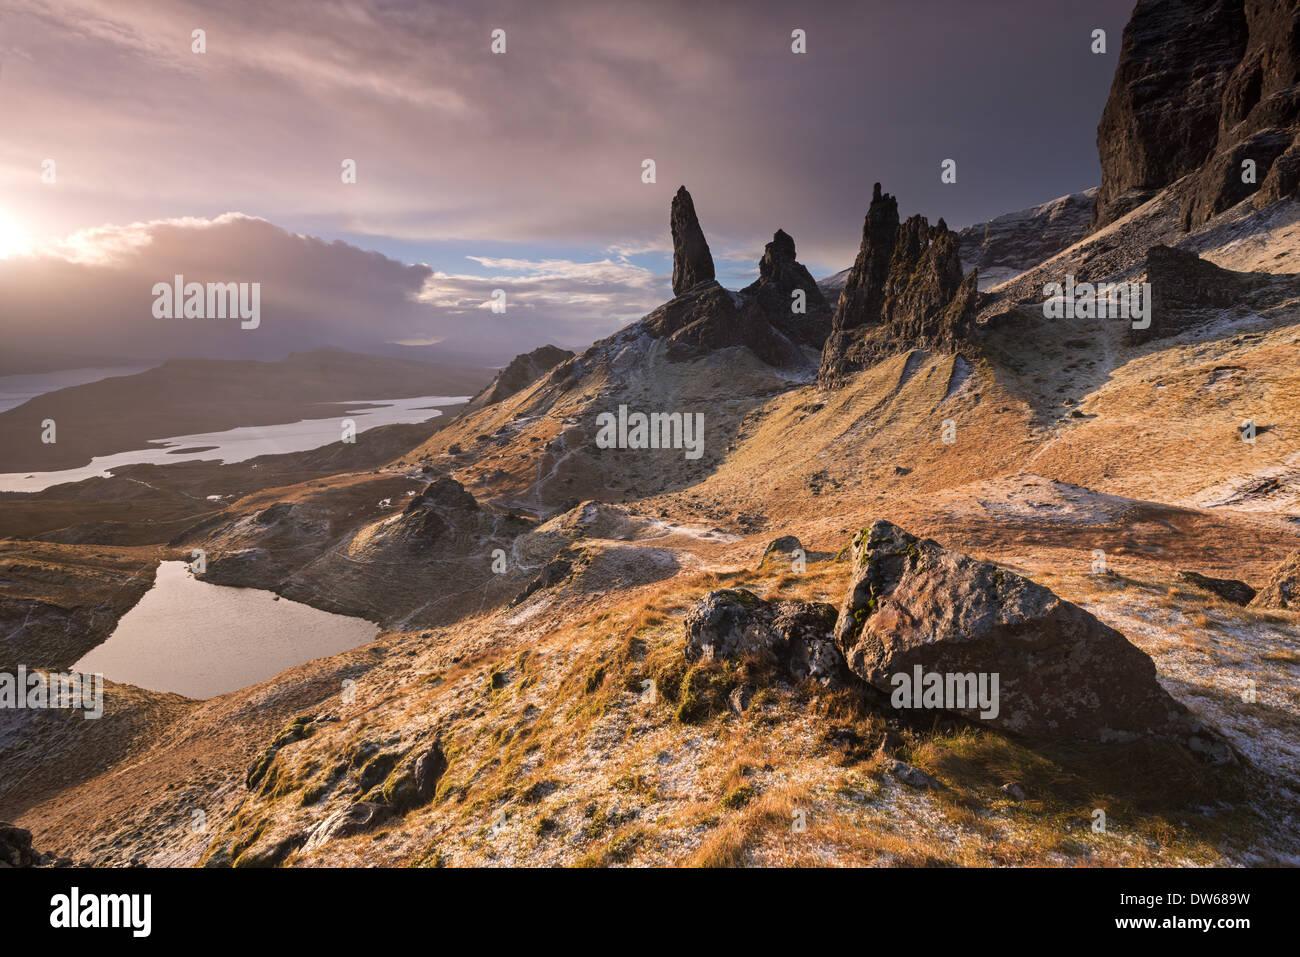 Dramatische Landschaft an der Old Man of Storr, Isle Of Skye, Schottland. Winter (Dezember) 2013. Stockbild